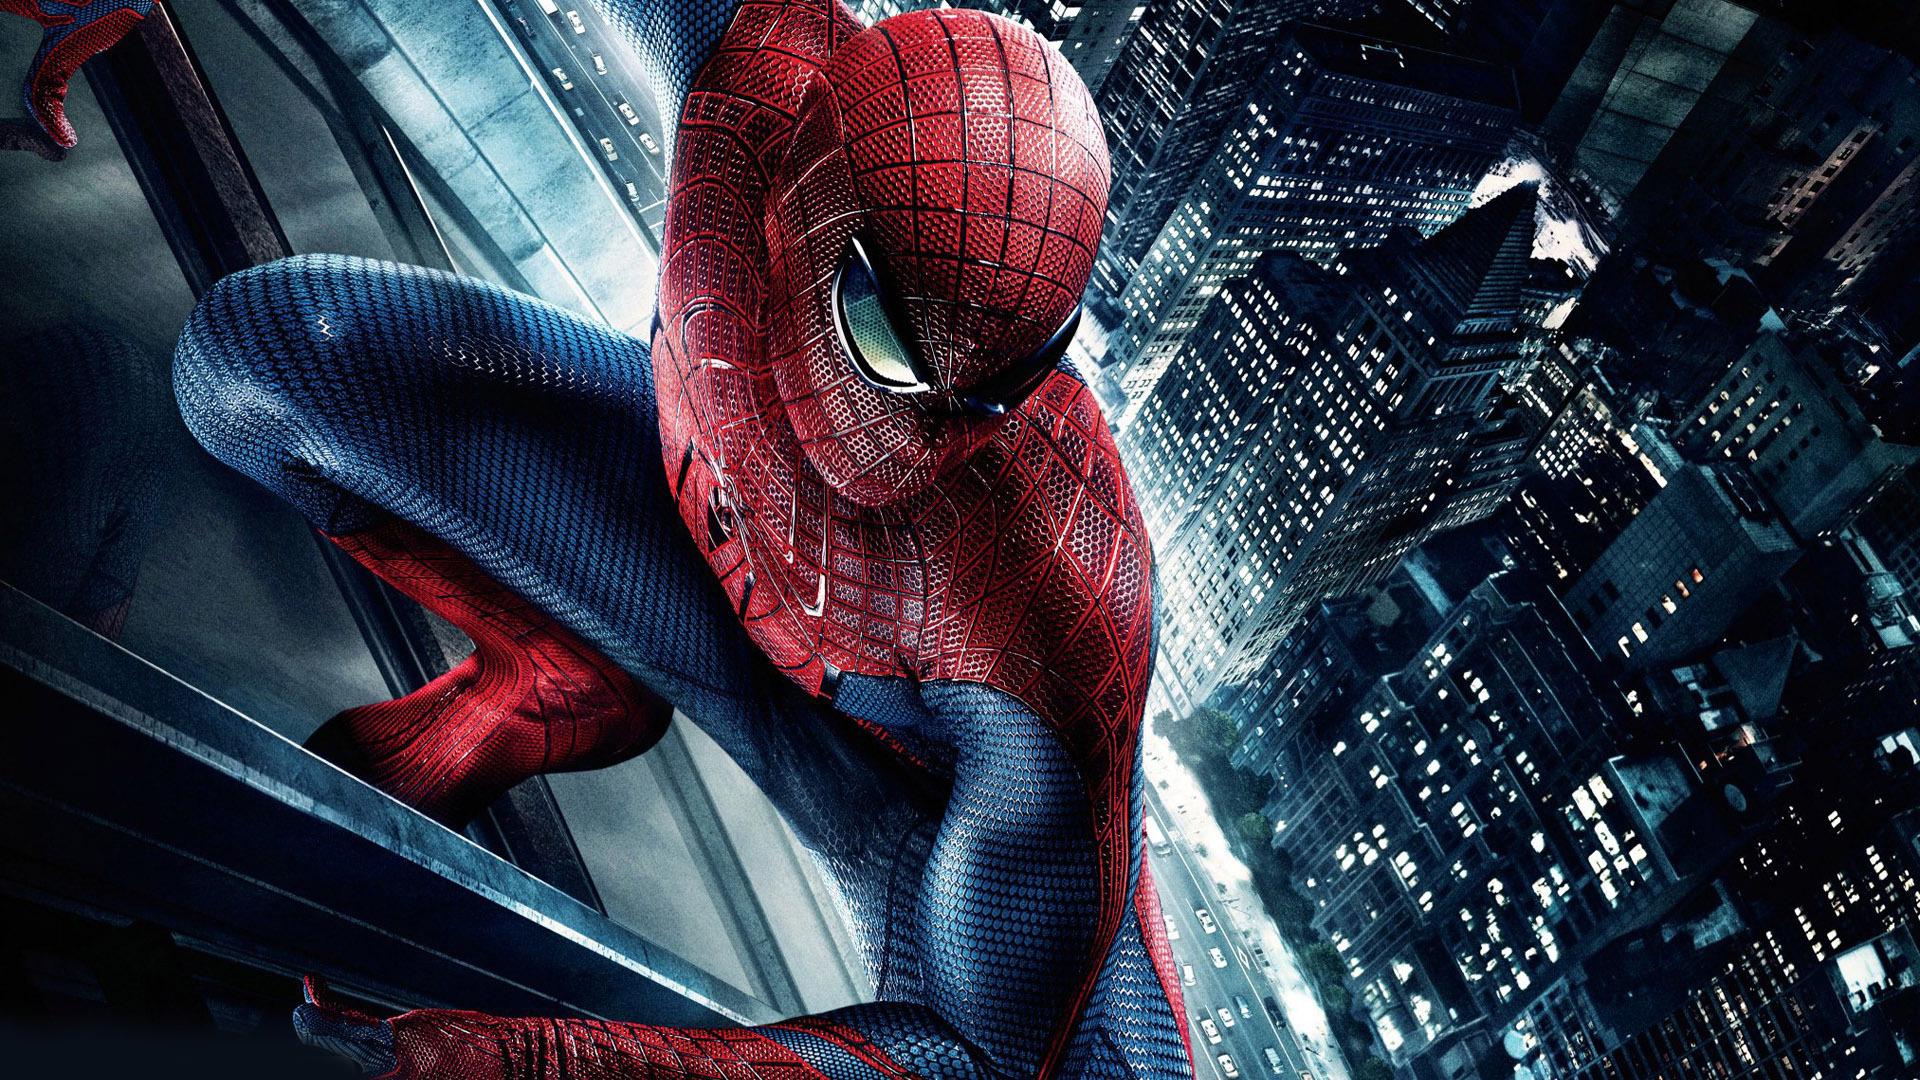 Hd Amazing Spider Man 2 Wallpaper